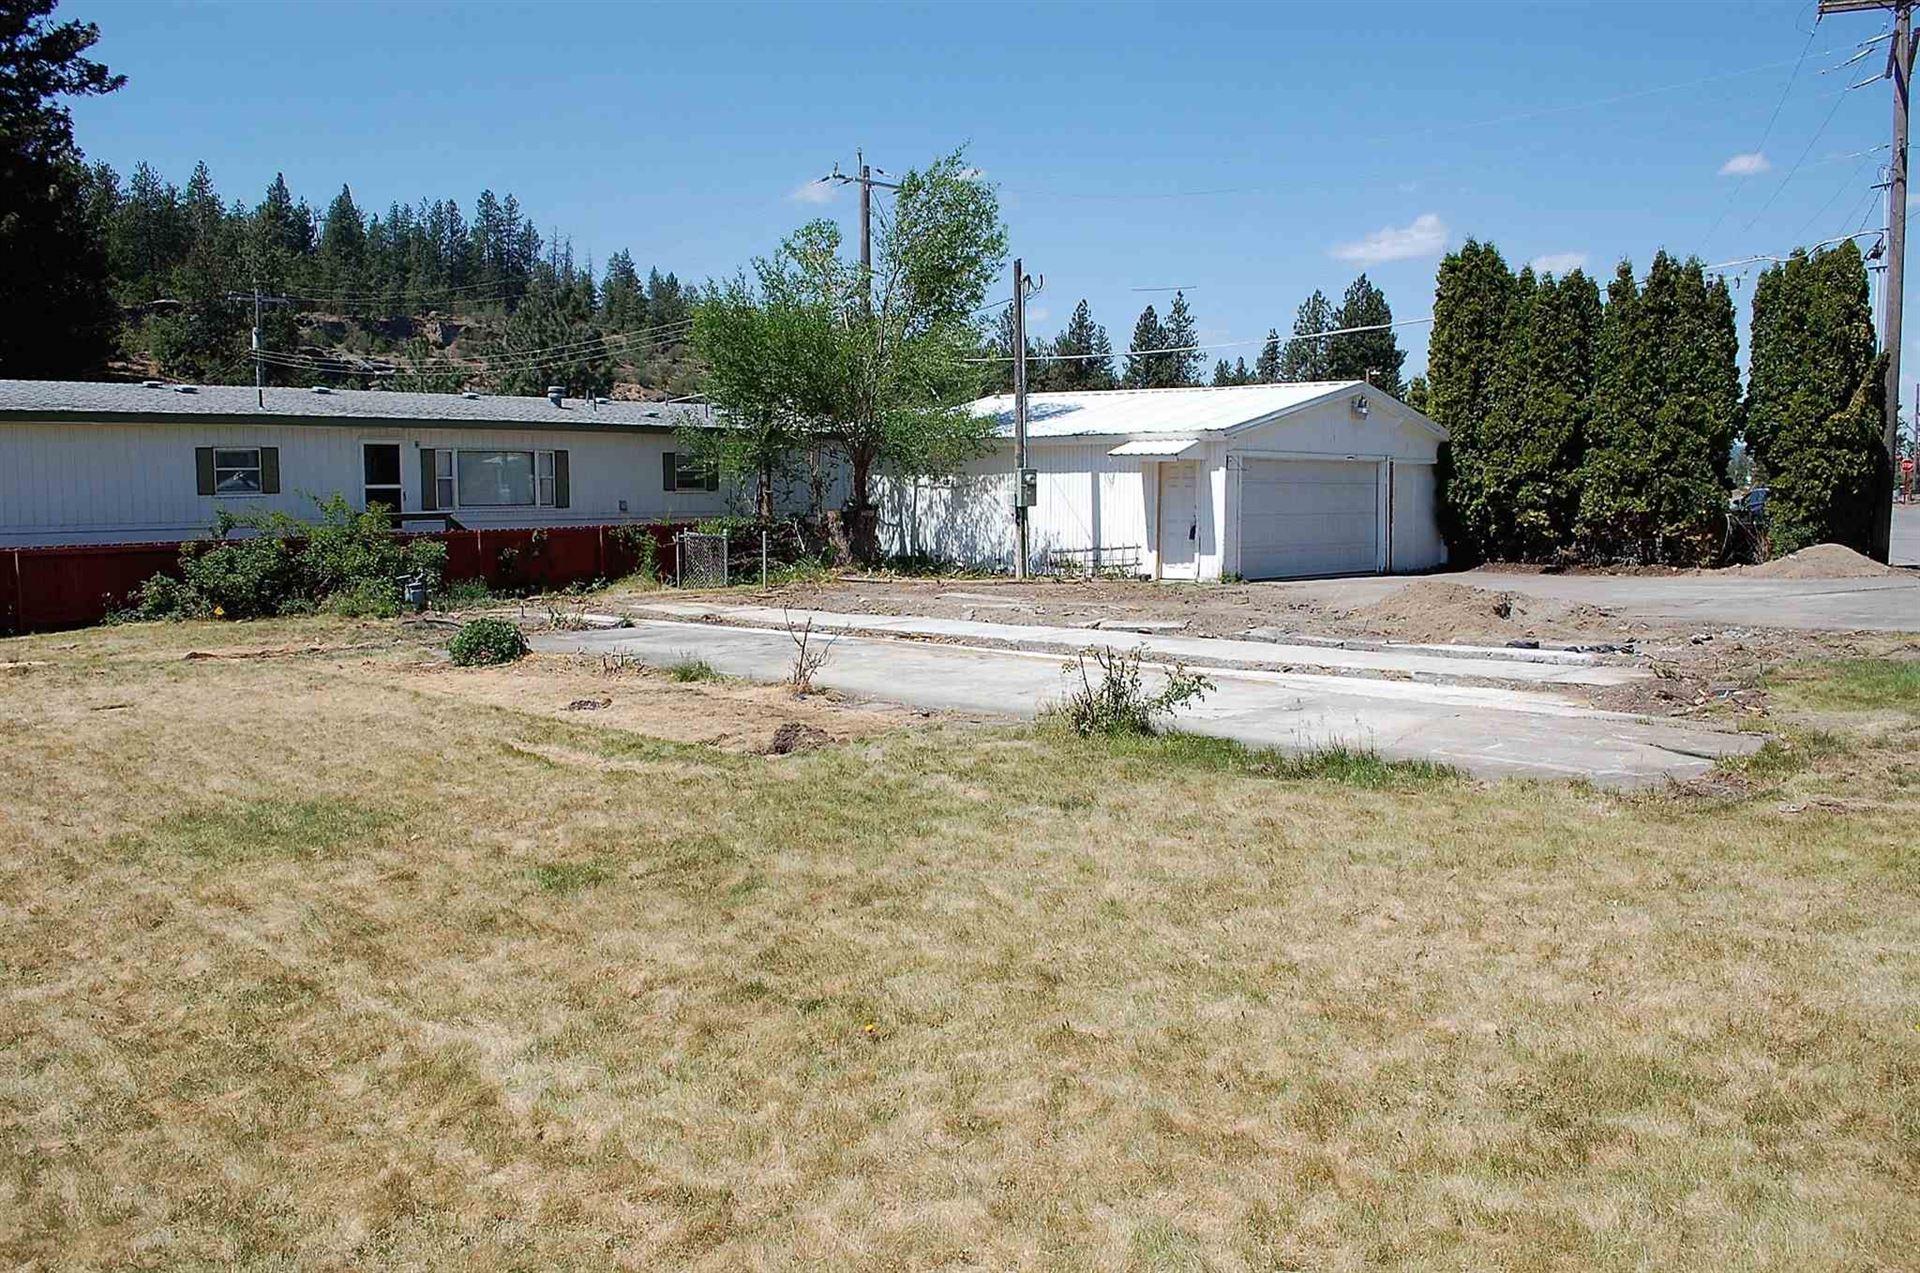 902 S Nina Cir, Spokane Valley, WA 99206 - #: 202115644